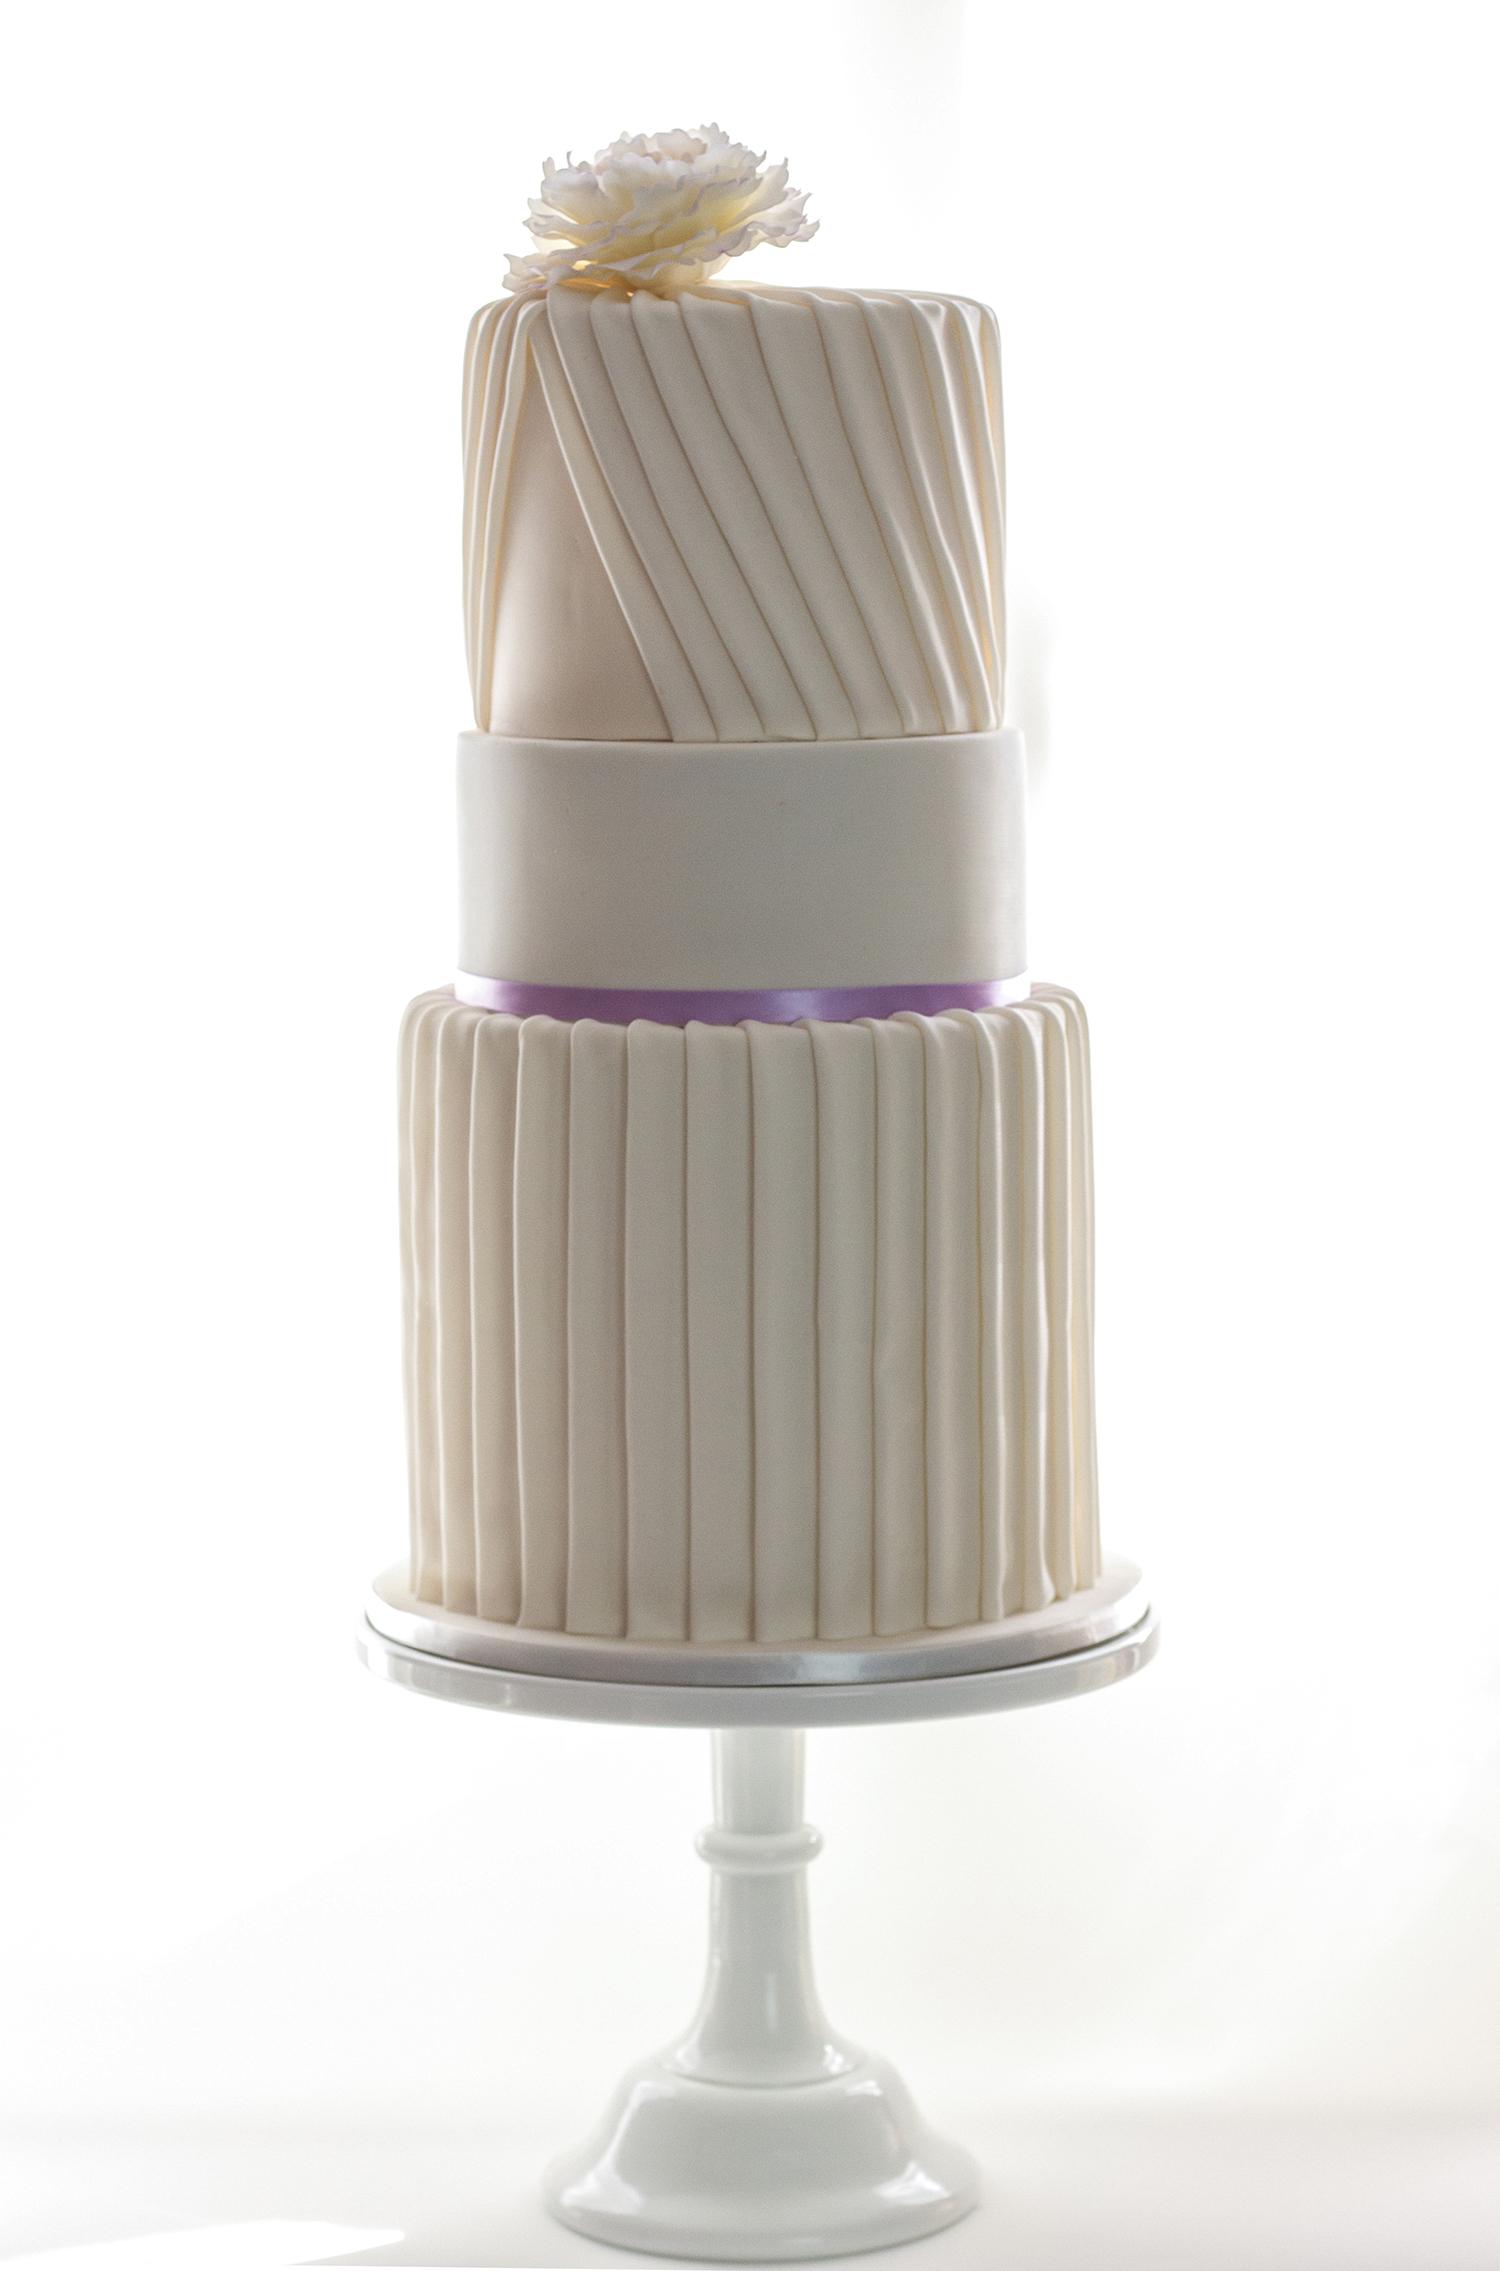 Jessica-Miles-Jessie-Lee-Cakes-Wedding-Elegant.jpg#asset:15617